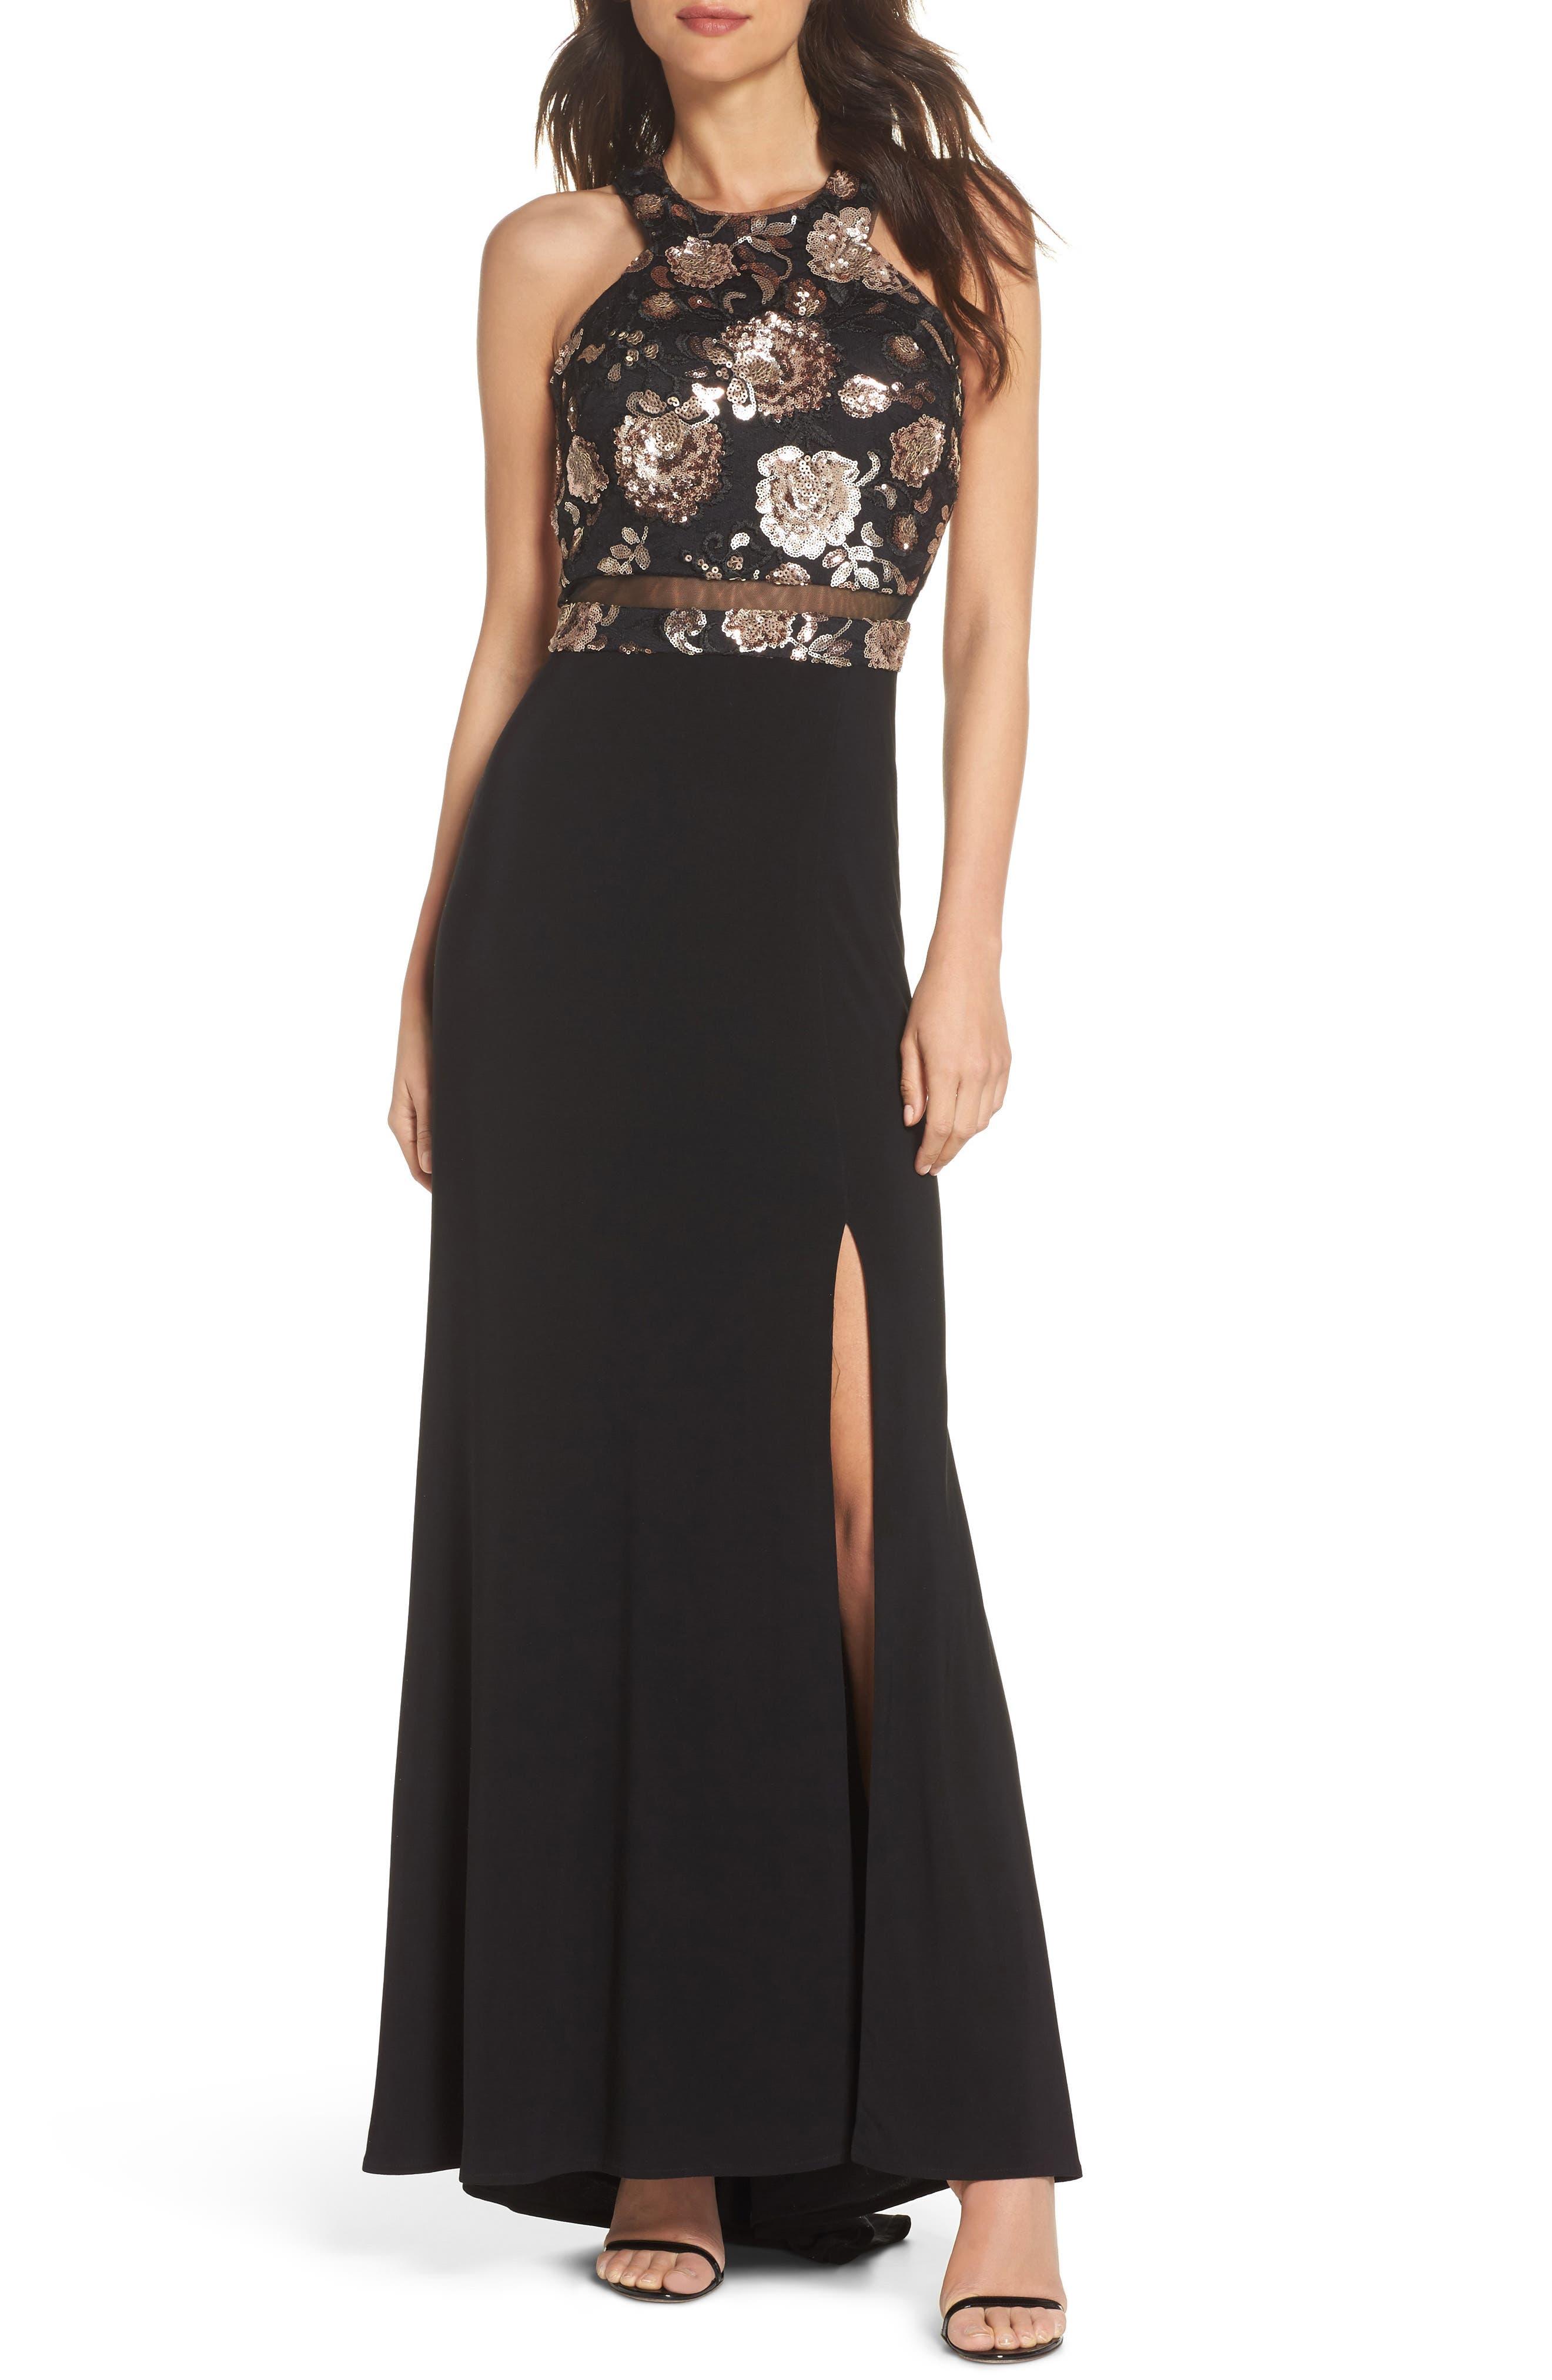 MORGAN & CO.,                             Sequin Mesh Panel Gown,                             Main thumbnail 1, color,                             BLACK / ROSE GOLD